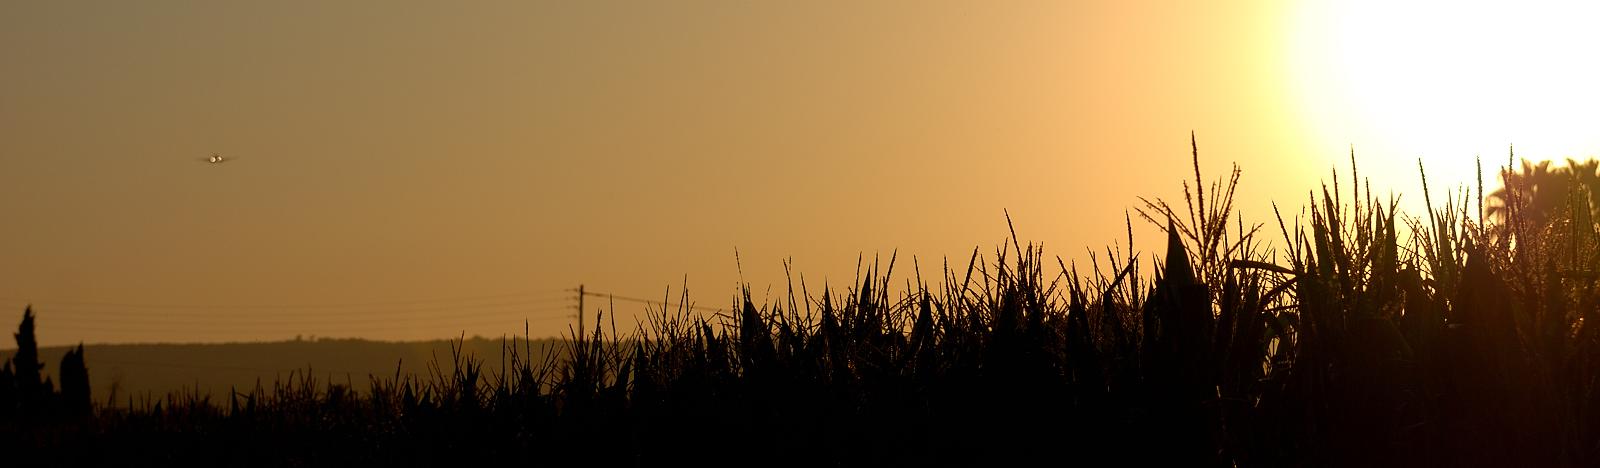 Sunrise auf Mallorca